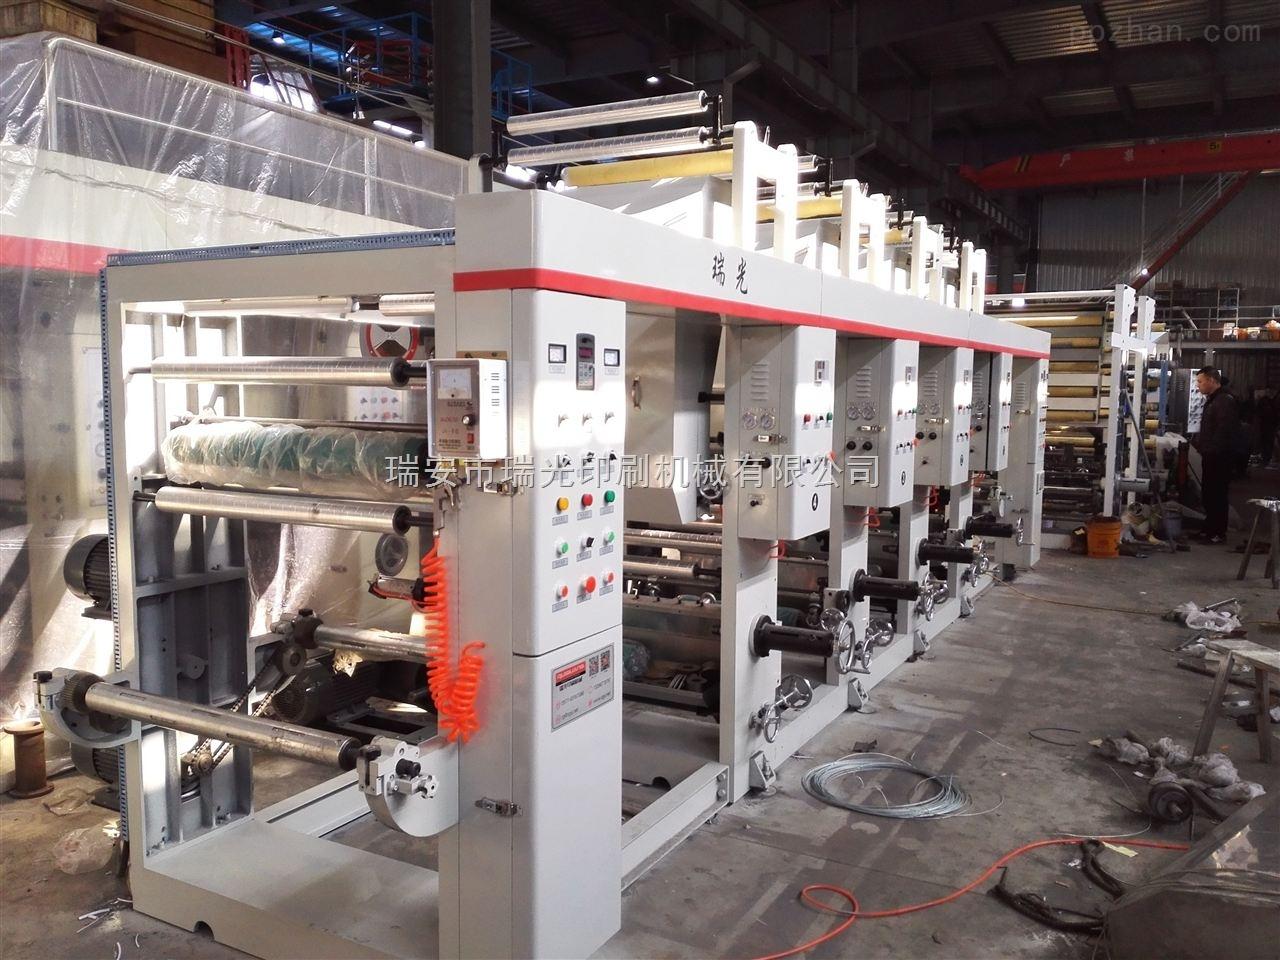 ASY-800型6色-供应木纹纸印刷机、无纺布印刷机、转印纸印刷机厂家